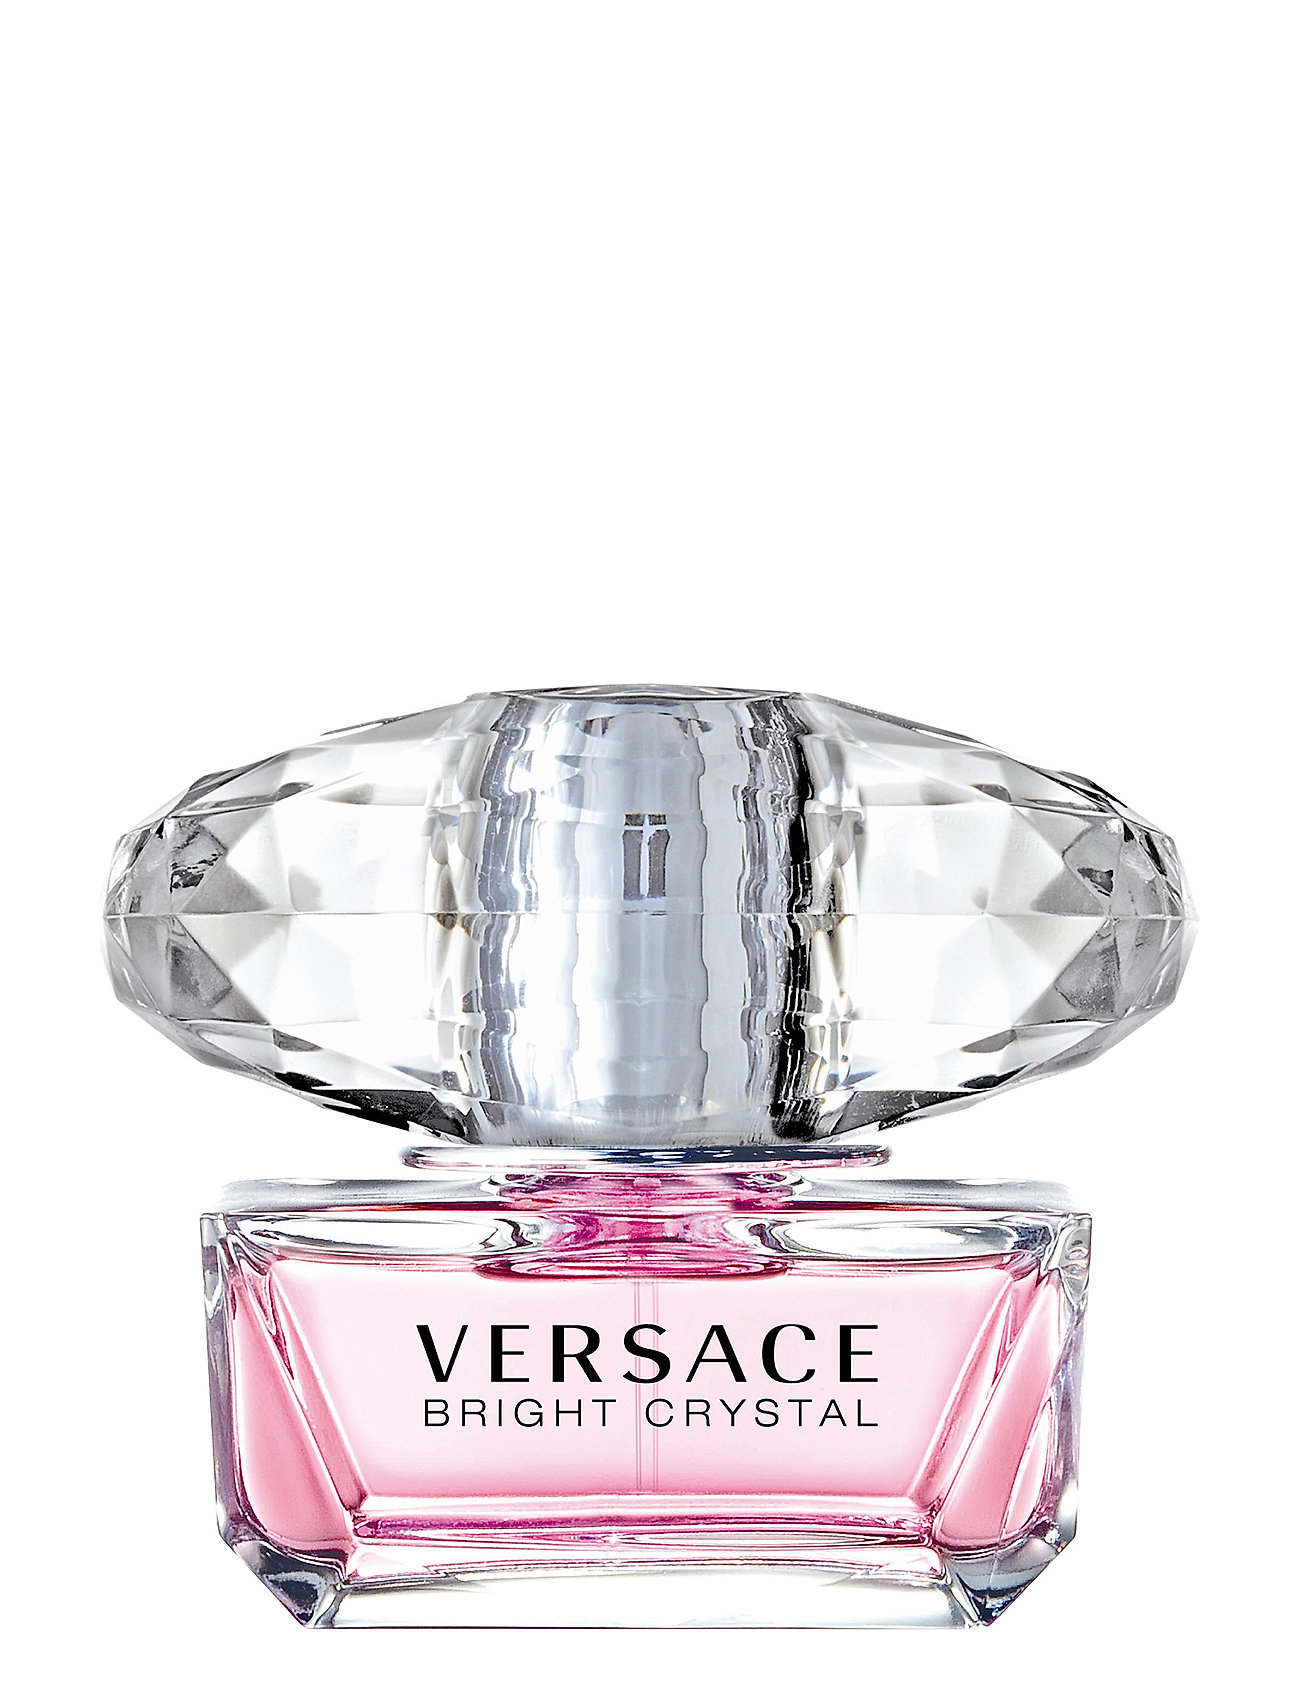 versace fragrance Versace bright crystal deodorant na fra boozt.com dk